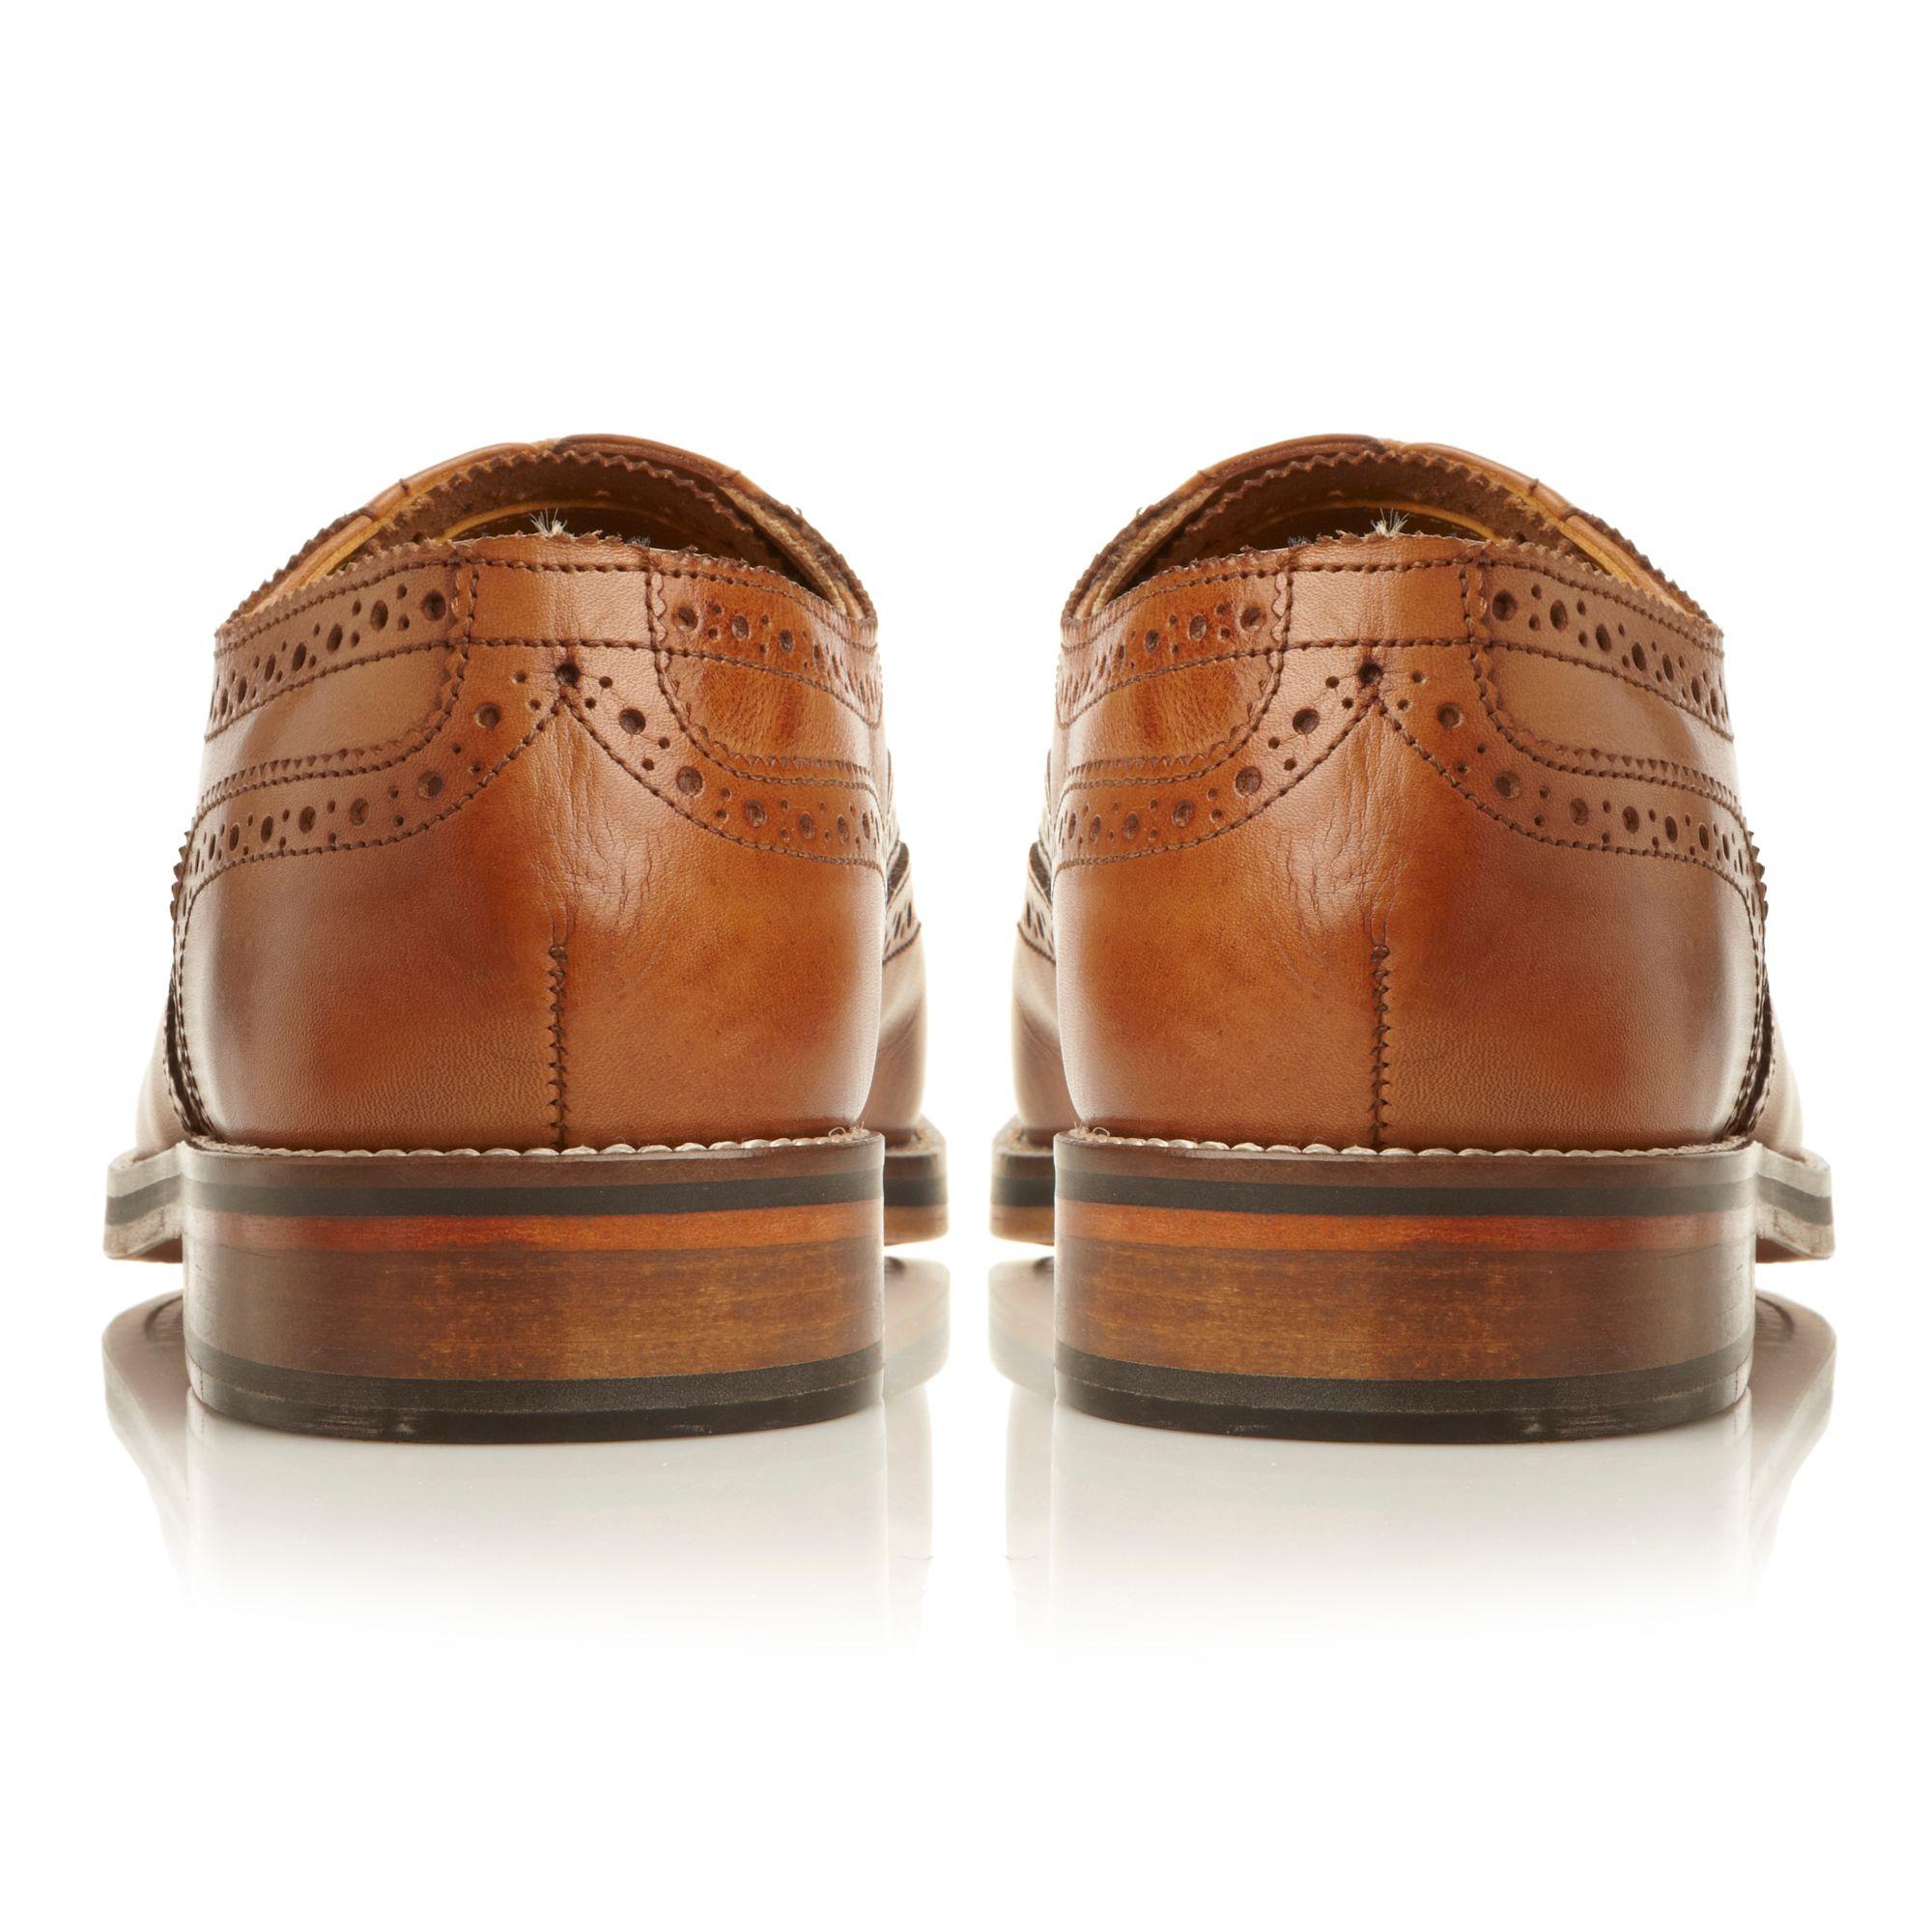 Bertie Shoes Australia